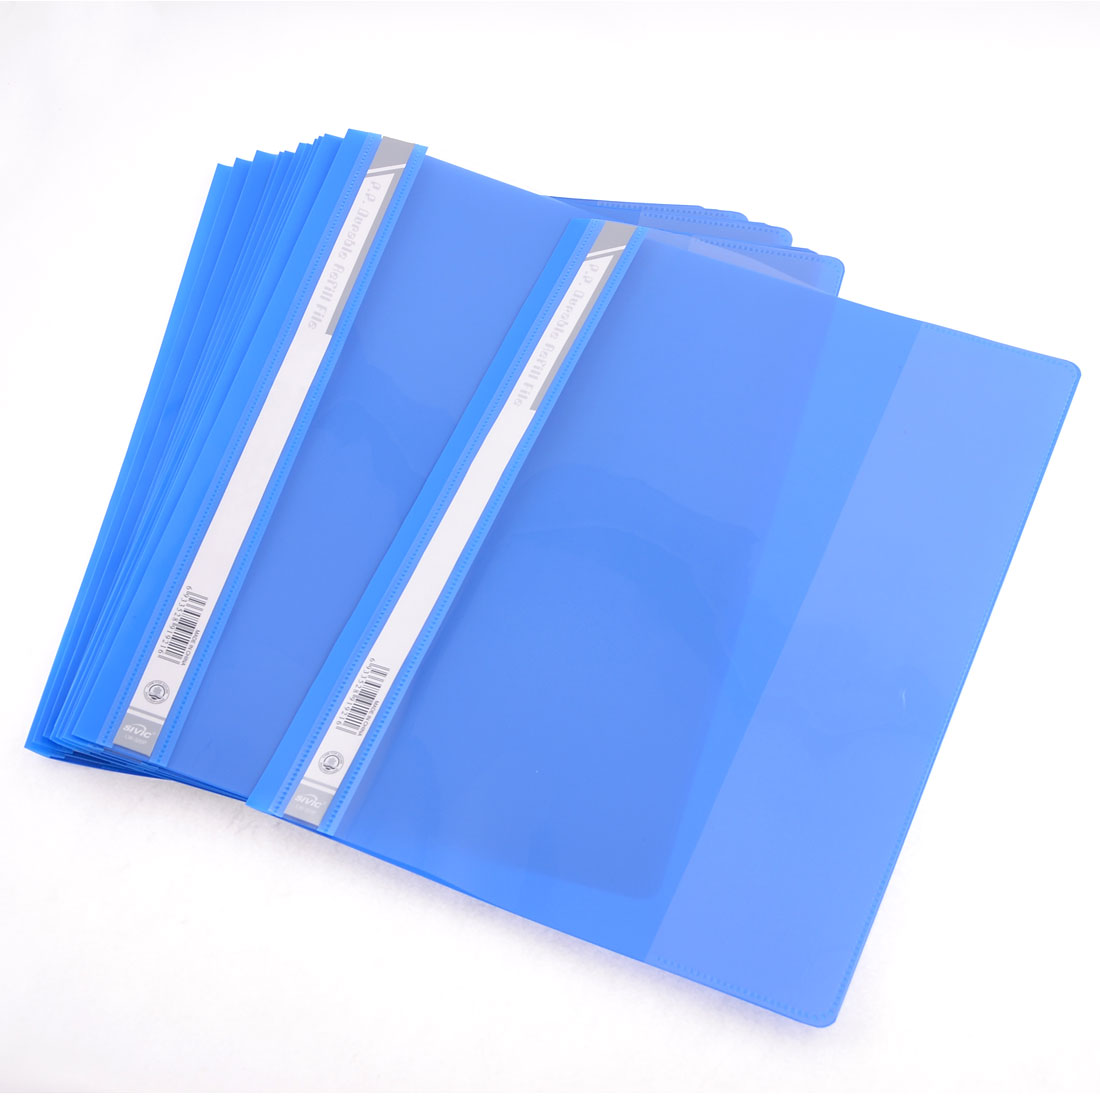 12 Pcs Size A4 Paper File Document Case Conference Folder Blue Clear